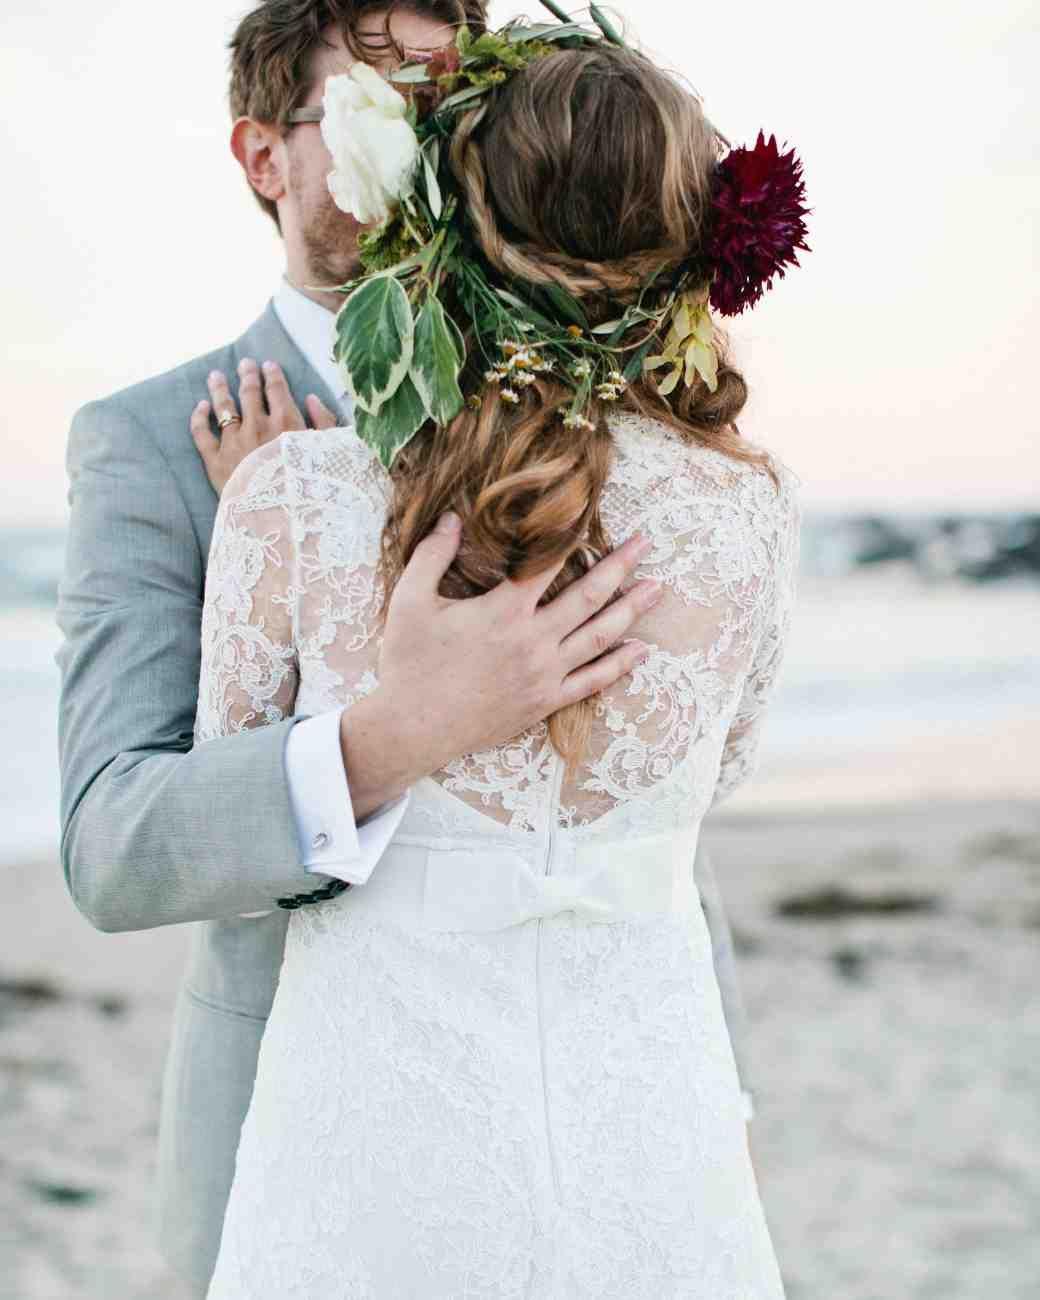 13 Braided Wedding Hairstyles We Love | Martha stewart weddings ...